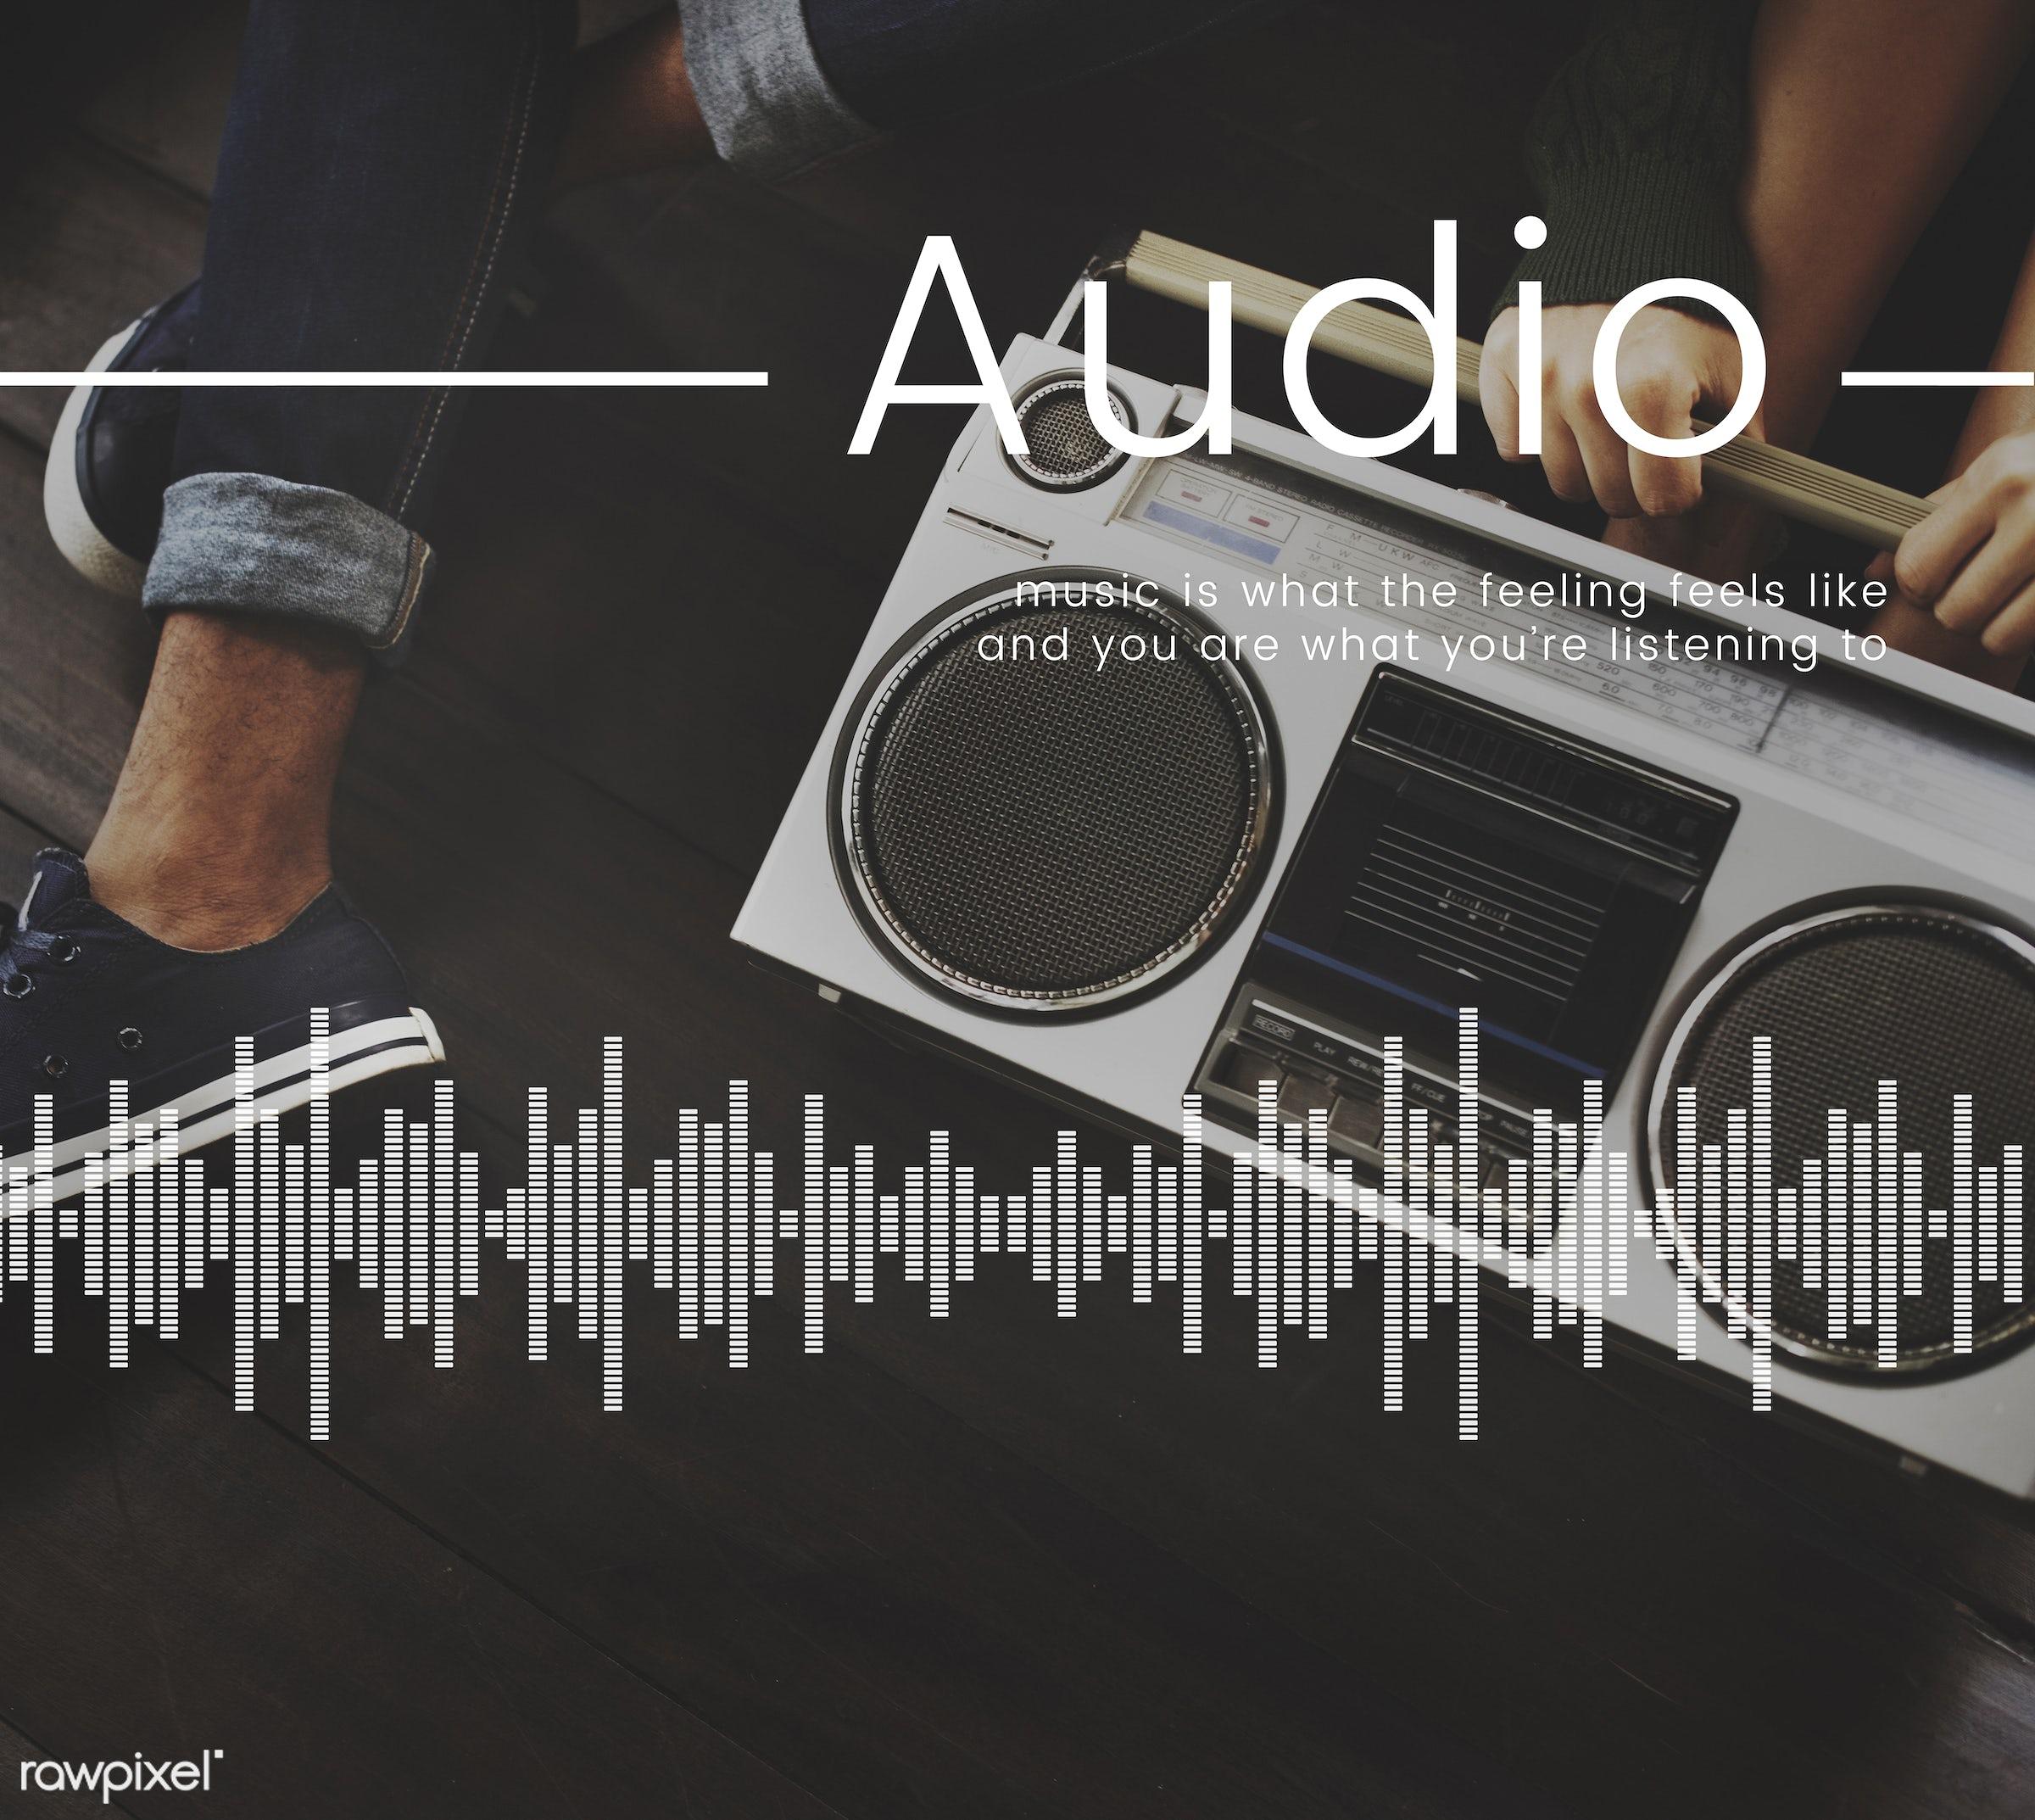 radio, acoustic, audio, broadcast, chilling, enjoyment, entertain, entertainment, genres, gifteye, graphic, icon,...